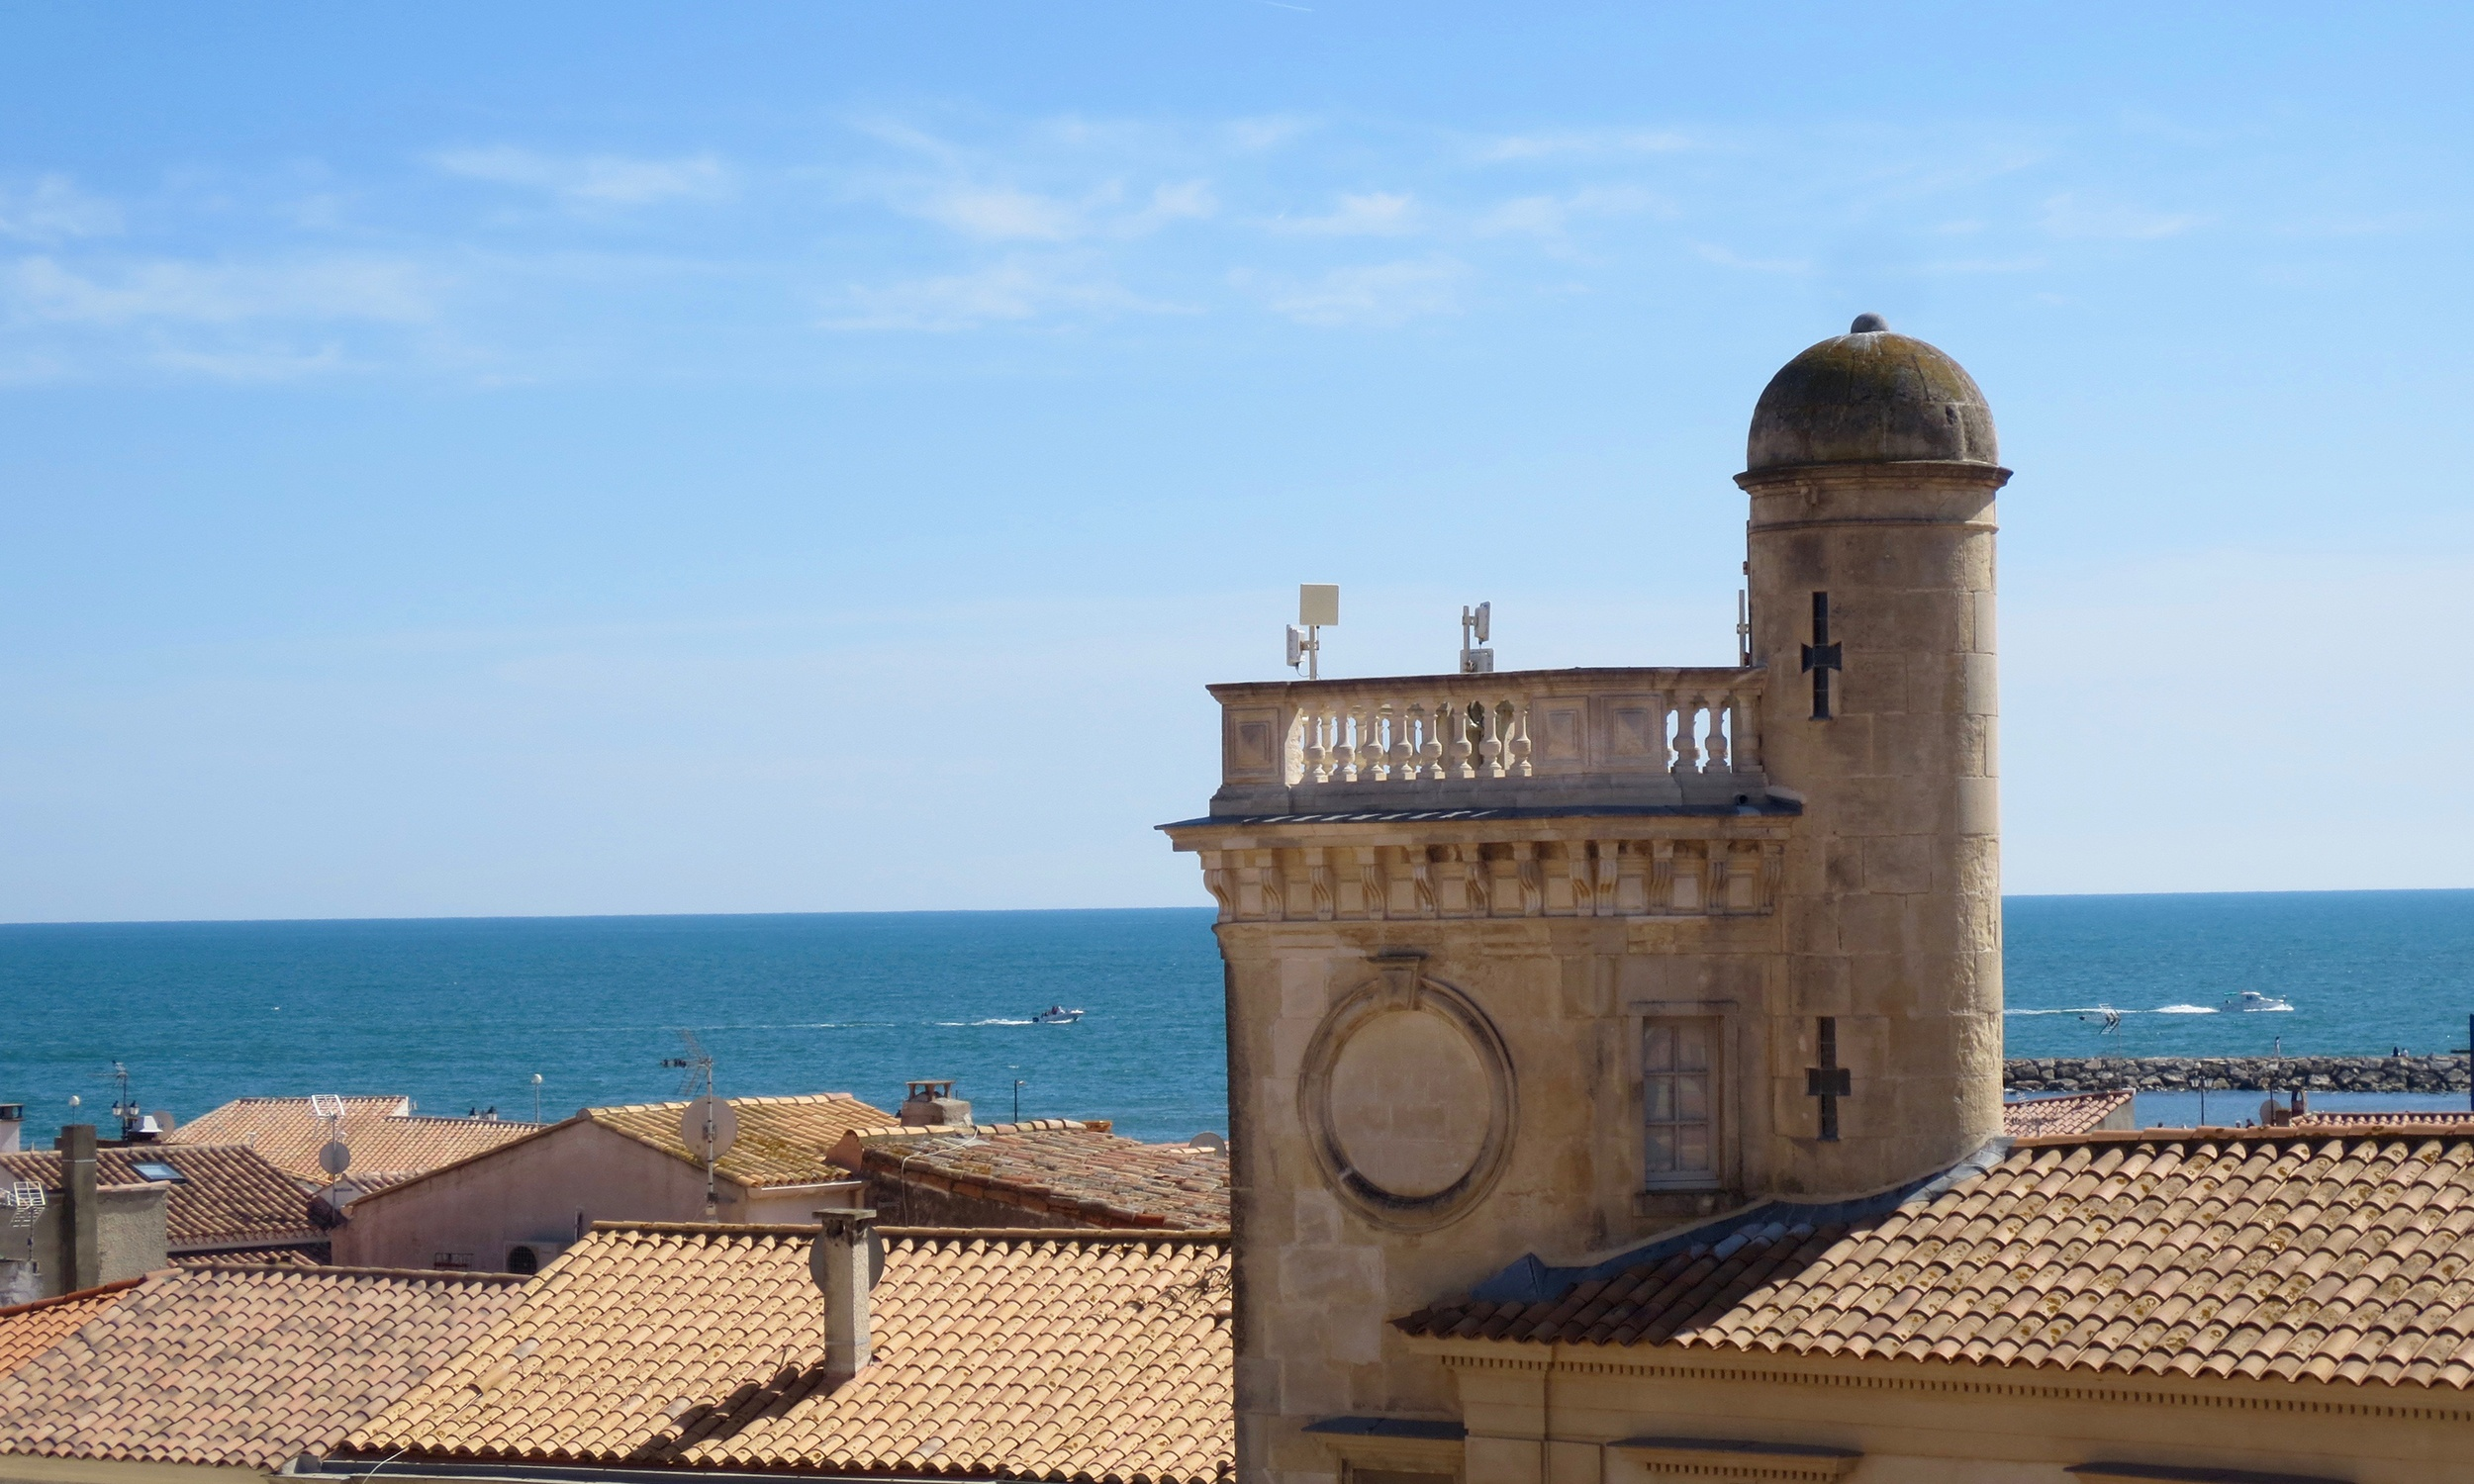 Rooftop views in Saintes-Maries-de-la-Mer, France